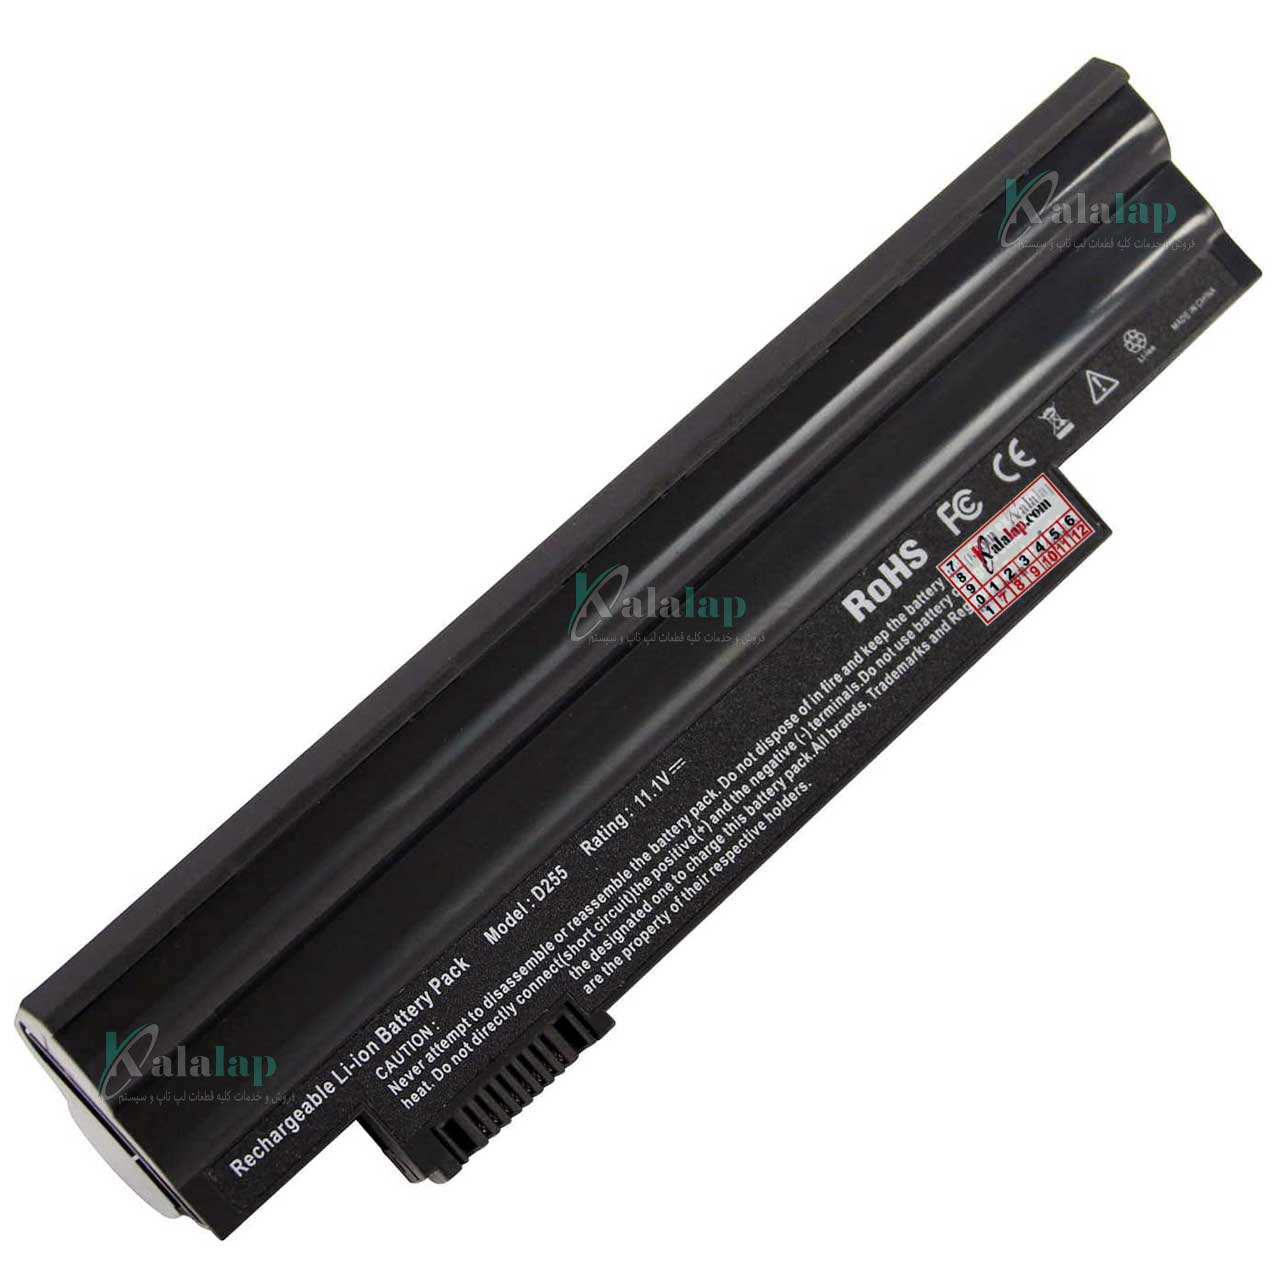 باتری لپ تاپ ایسر 522 D255 D260 722 d257